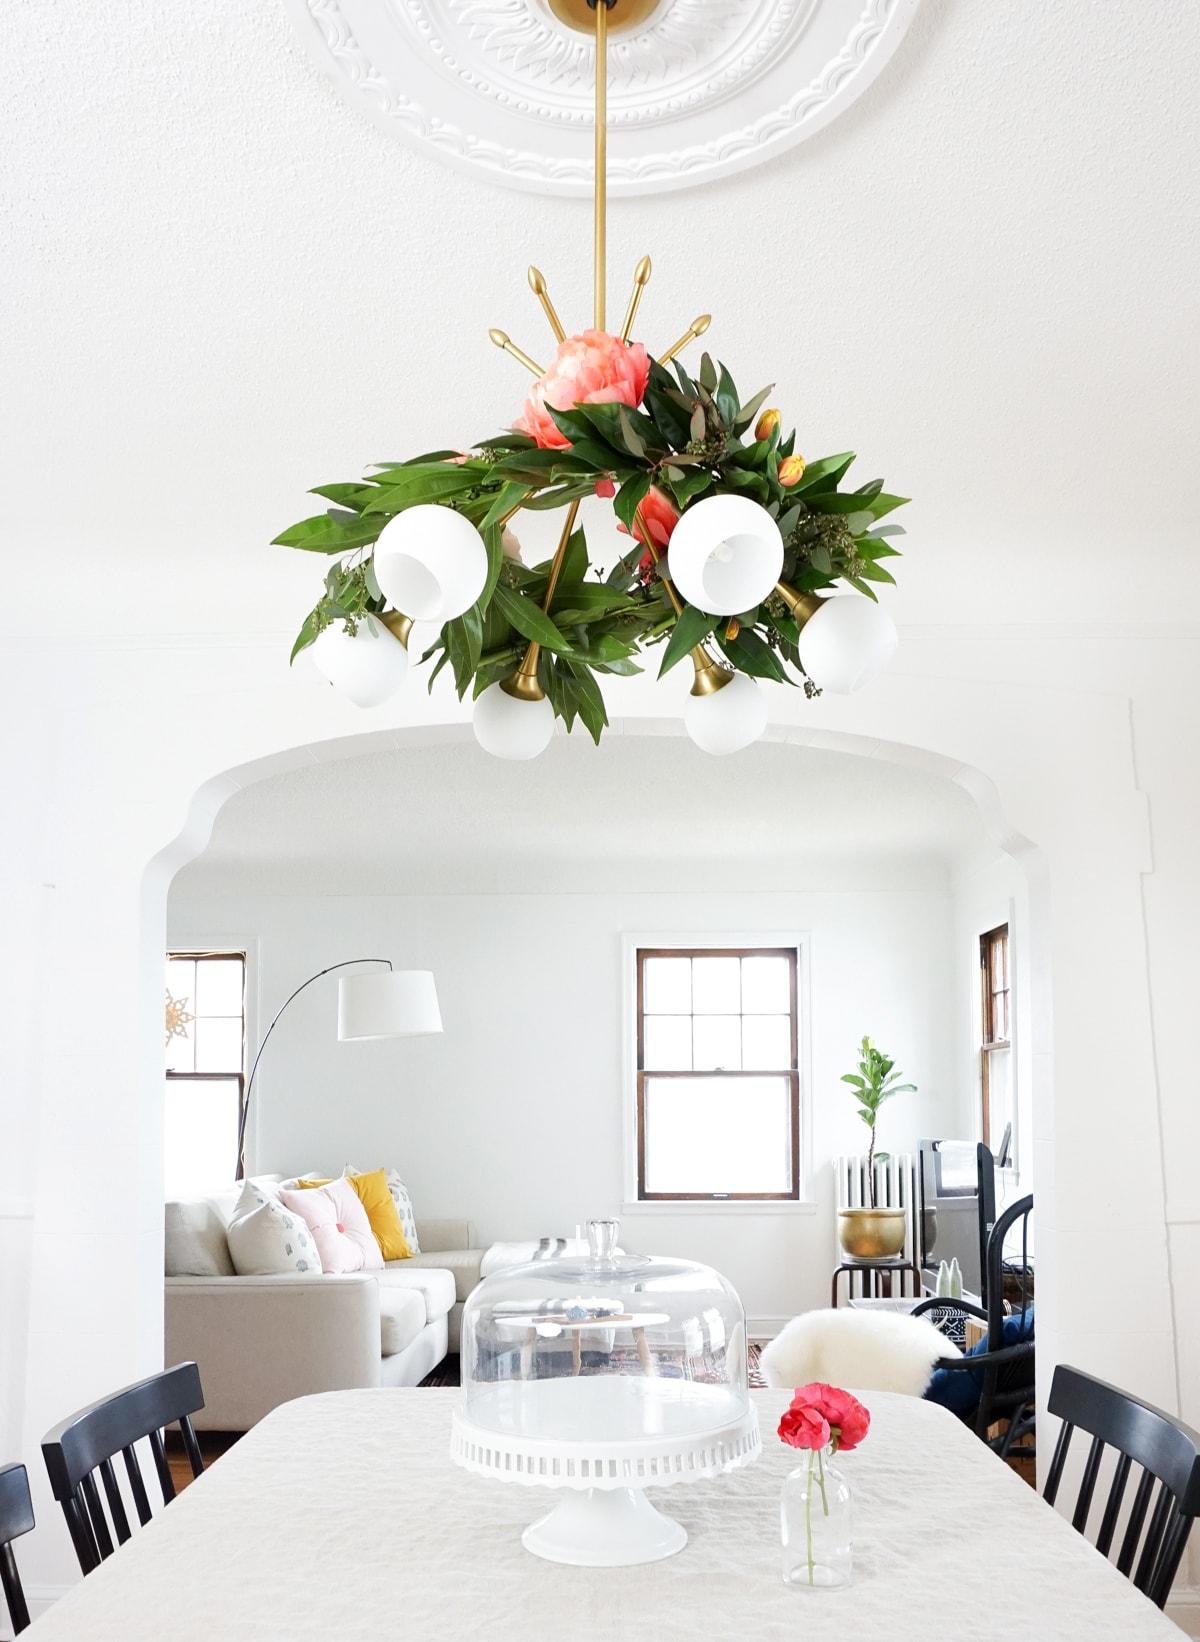 DIY Floral Chandelier Garland Sugar Cloth - Beautiful diy white flowers chandelier